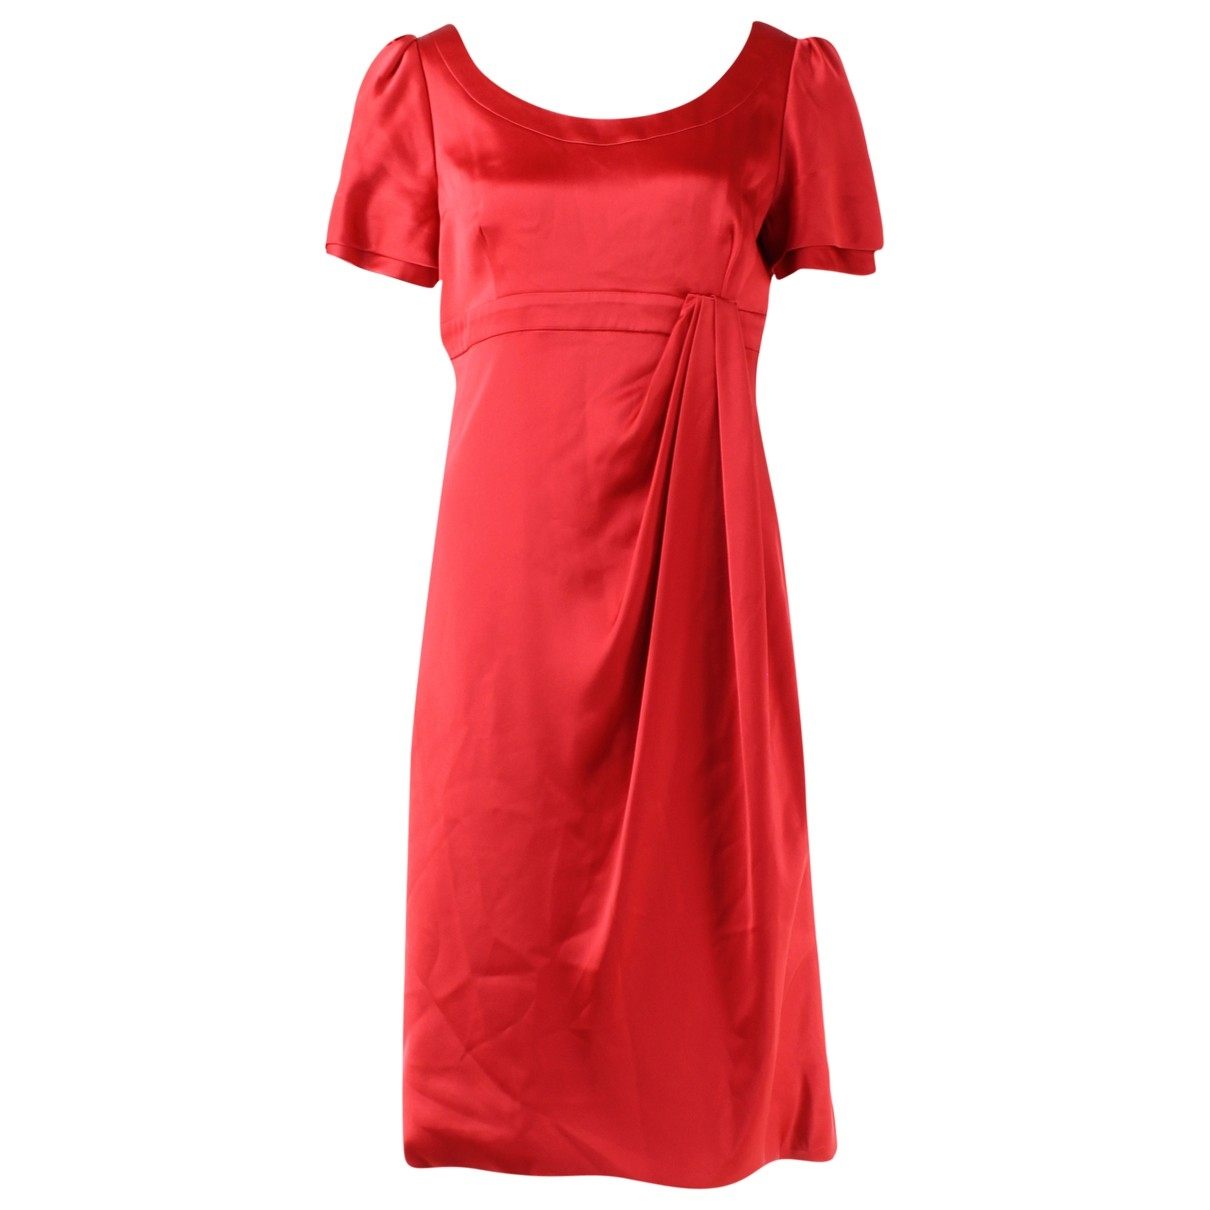 Karen Millen \N Kleid in  Rot Seide